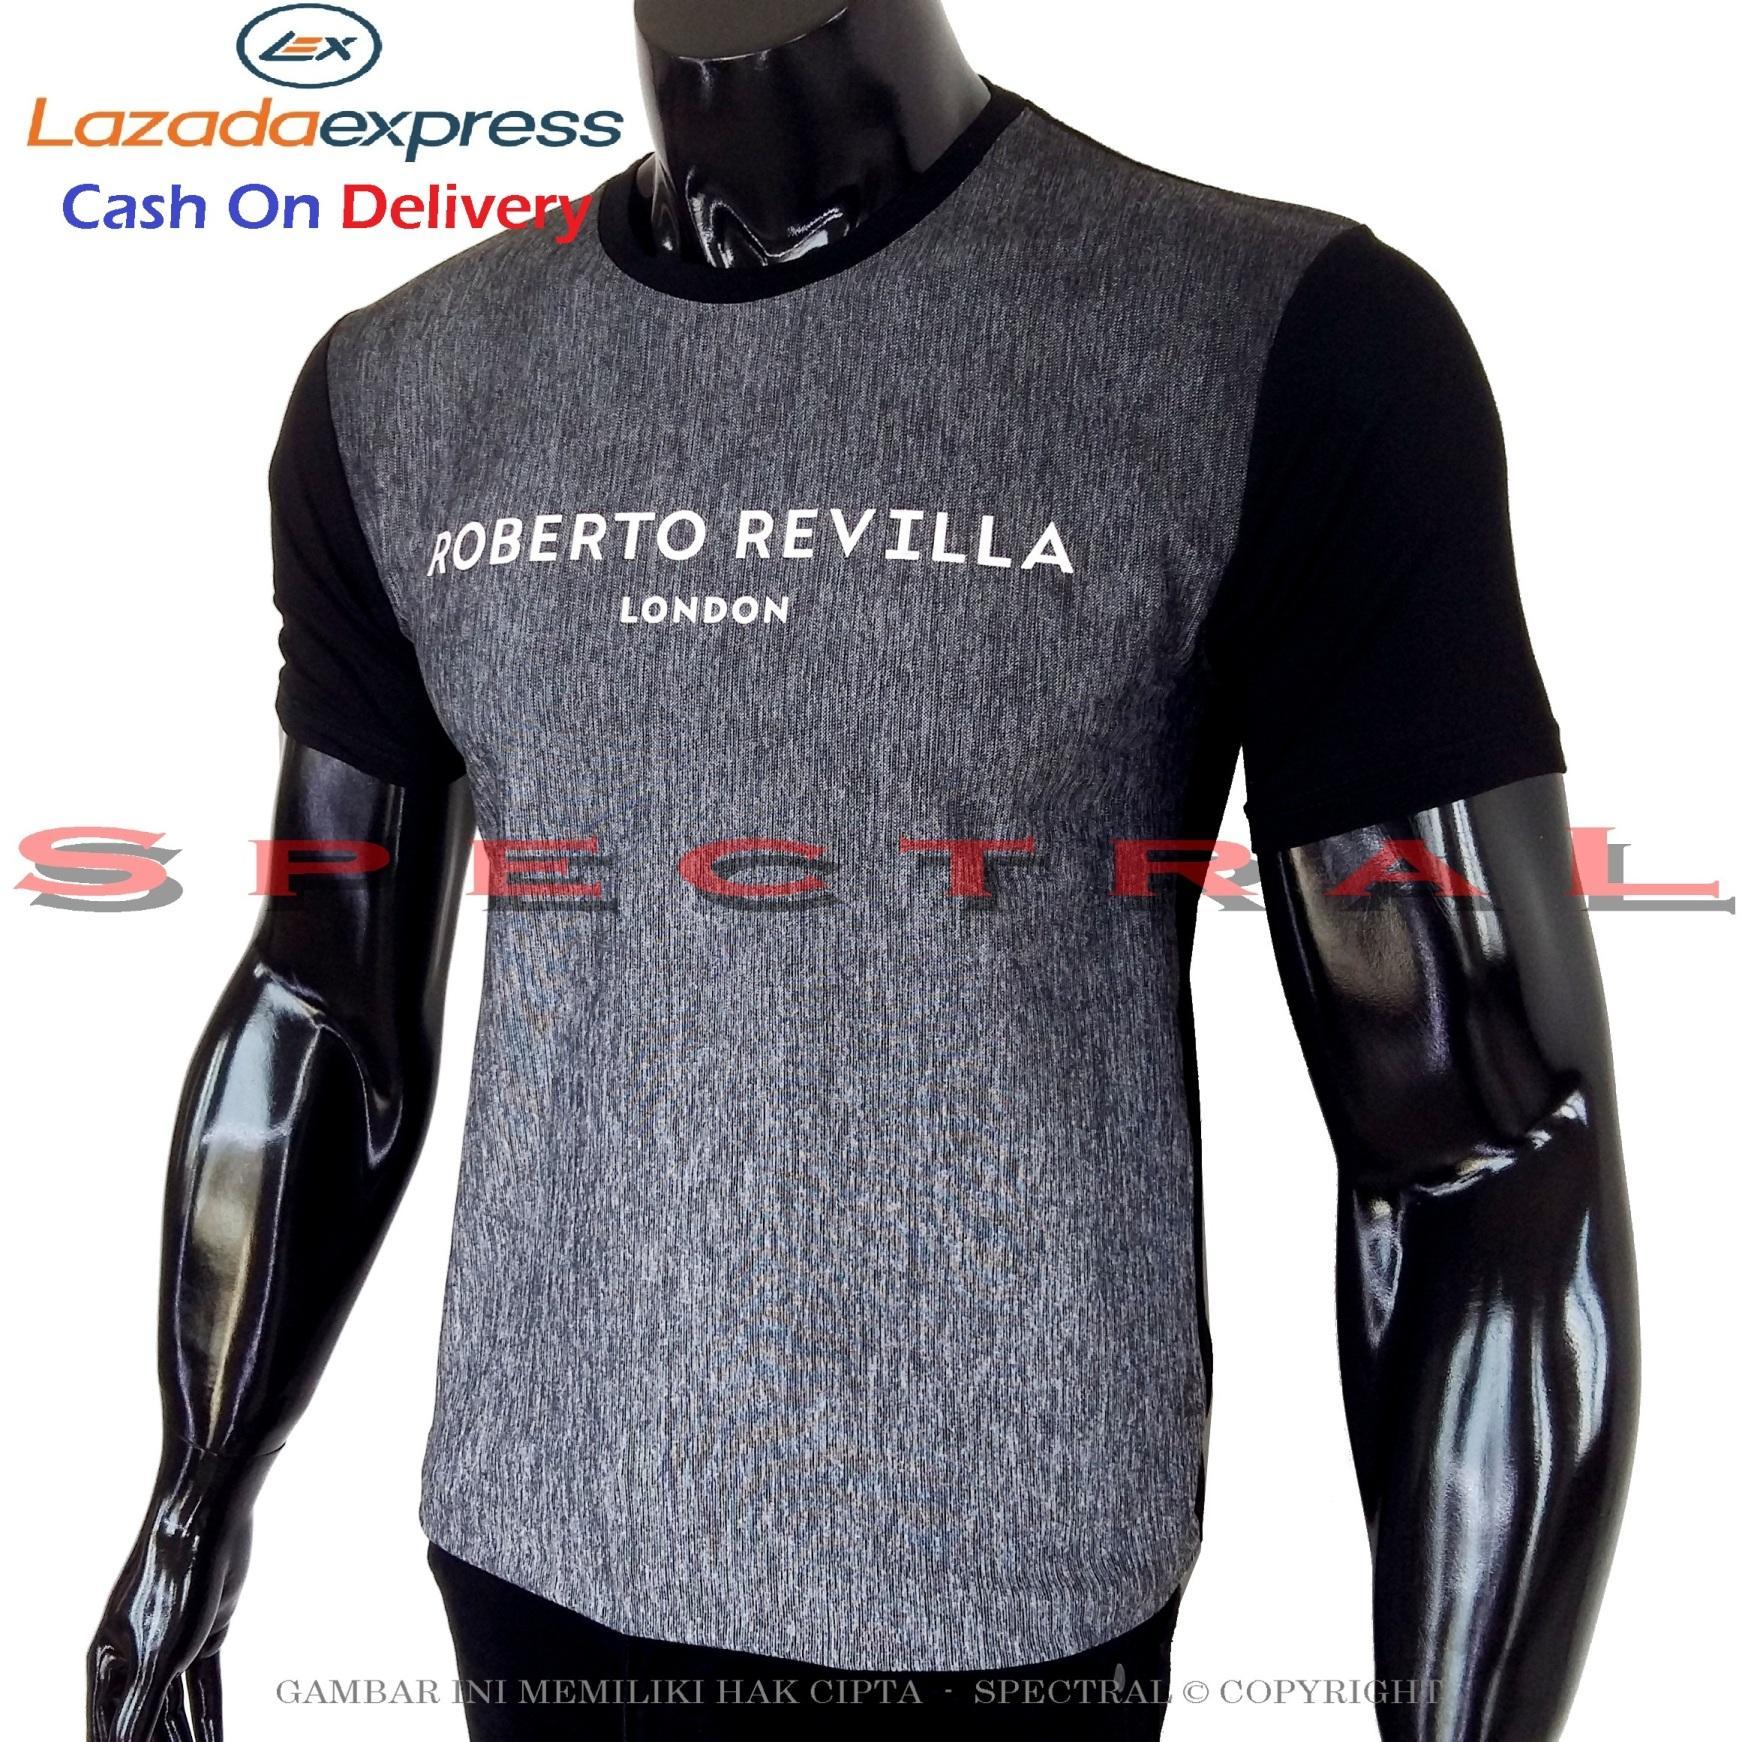 Spectral - Kaos Distro ROBERTO REVILLA London Soft Rayon Viscose Lycra Pola M Fit To L Simple Fashi